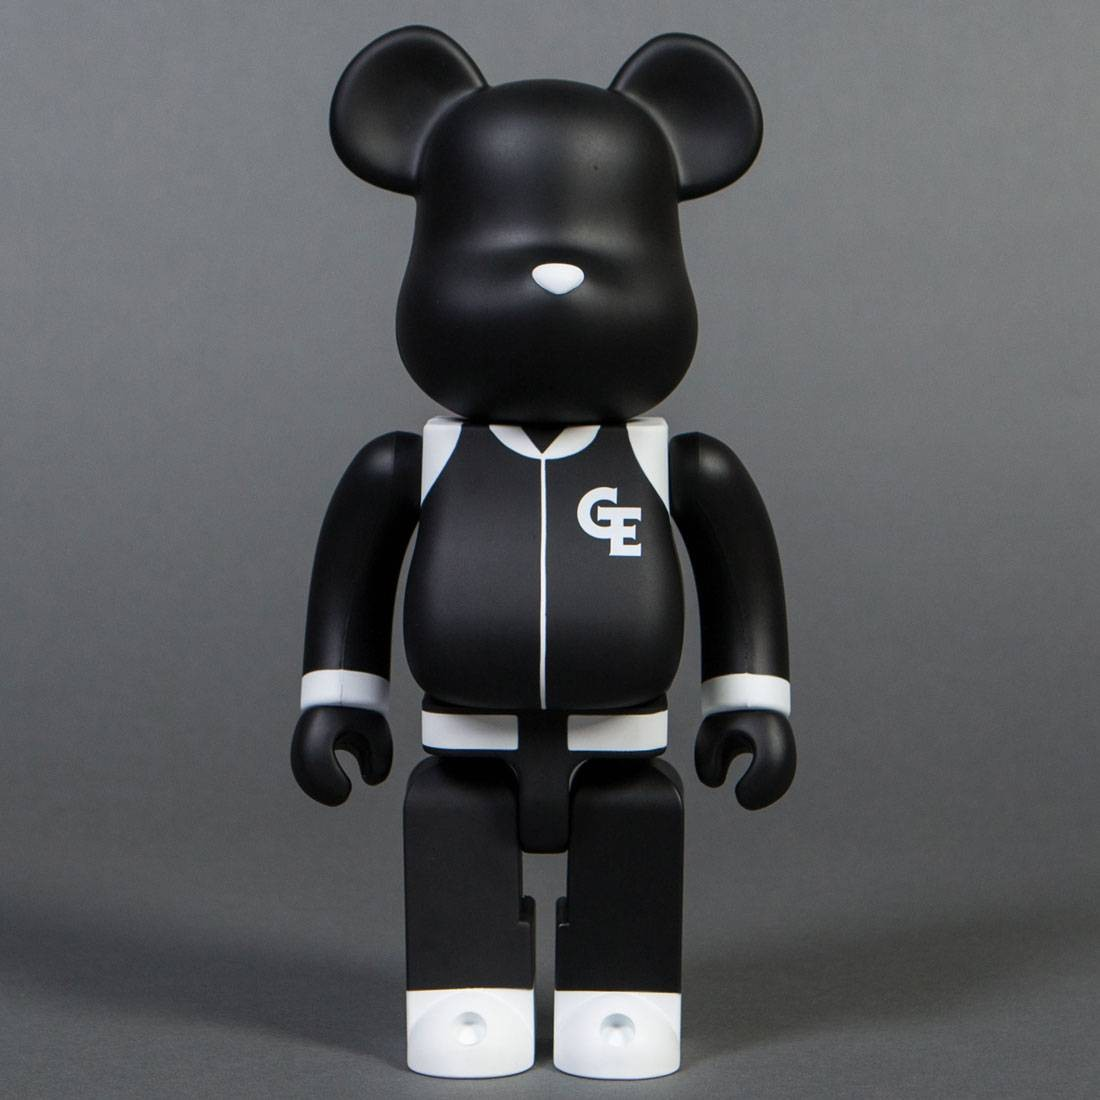 Medicom Goodenough Classic Black 400% Bearbrick Figure (black)